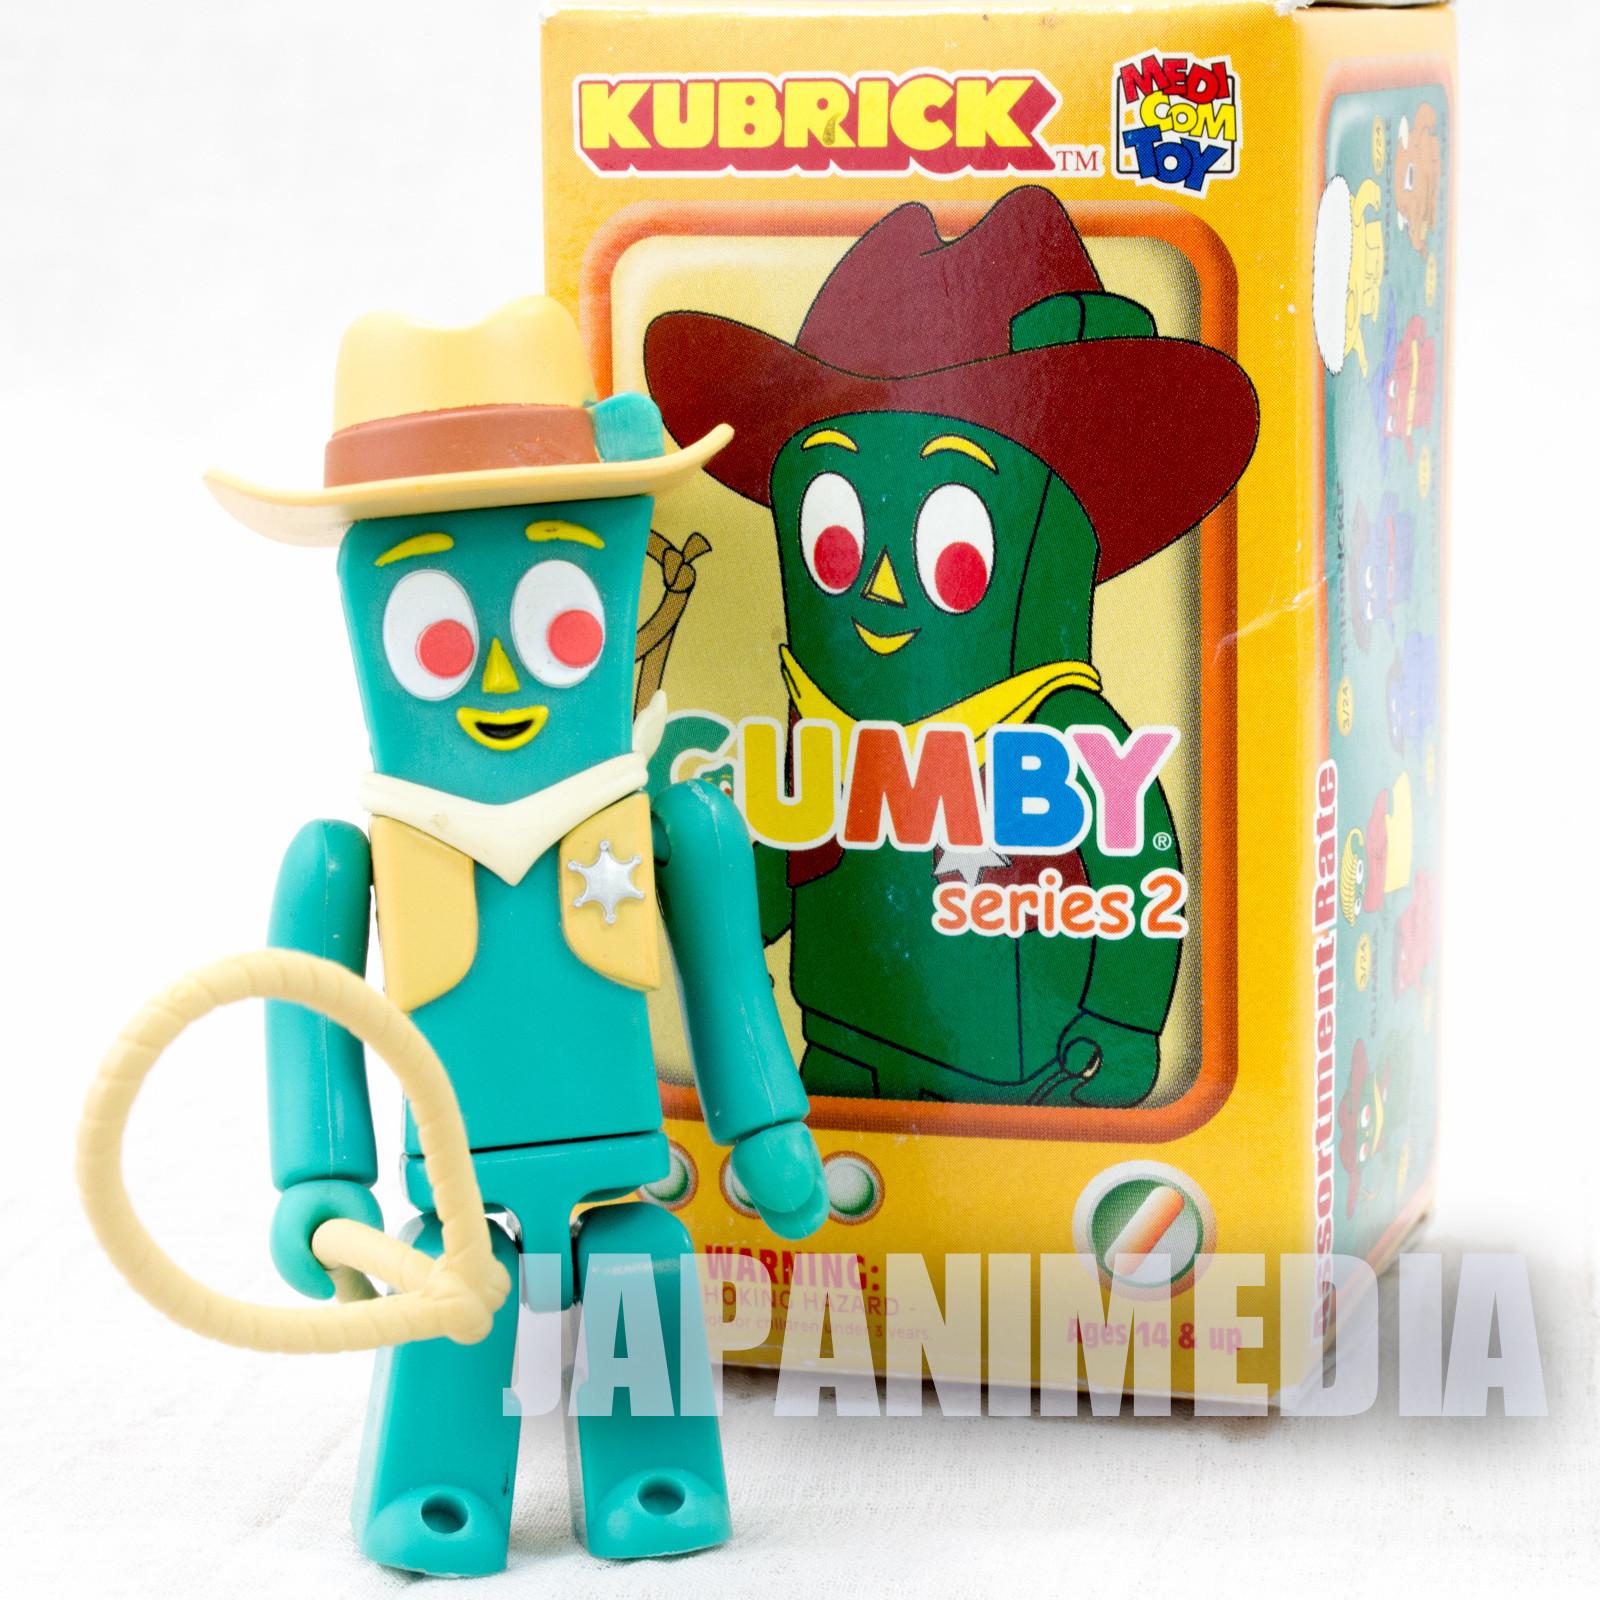 GUMBY Western Gumby Figure series 2 Kubrick Medicom Toy JAPAN